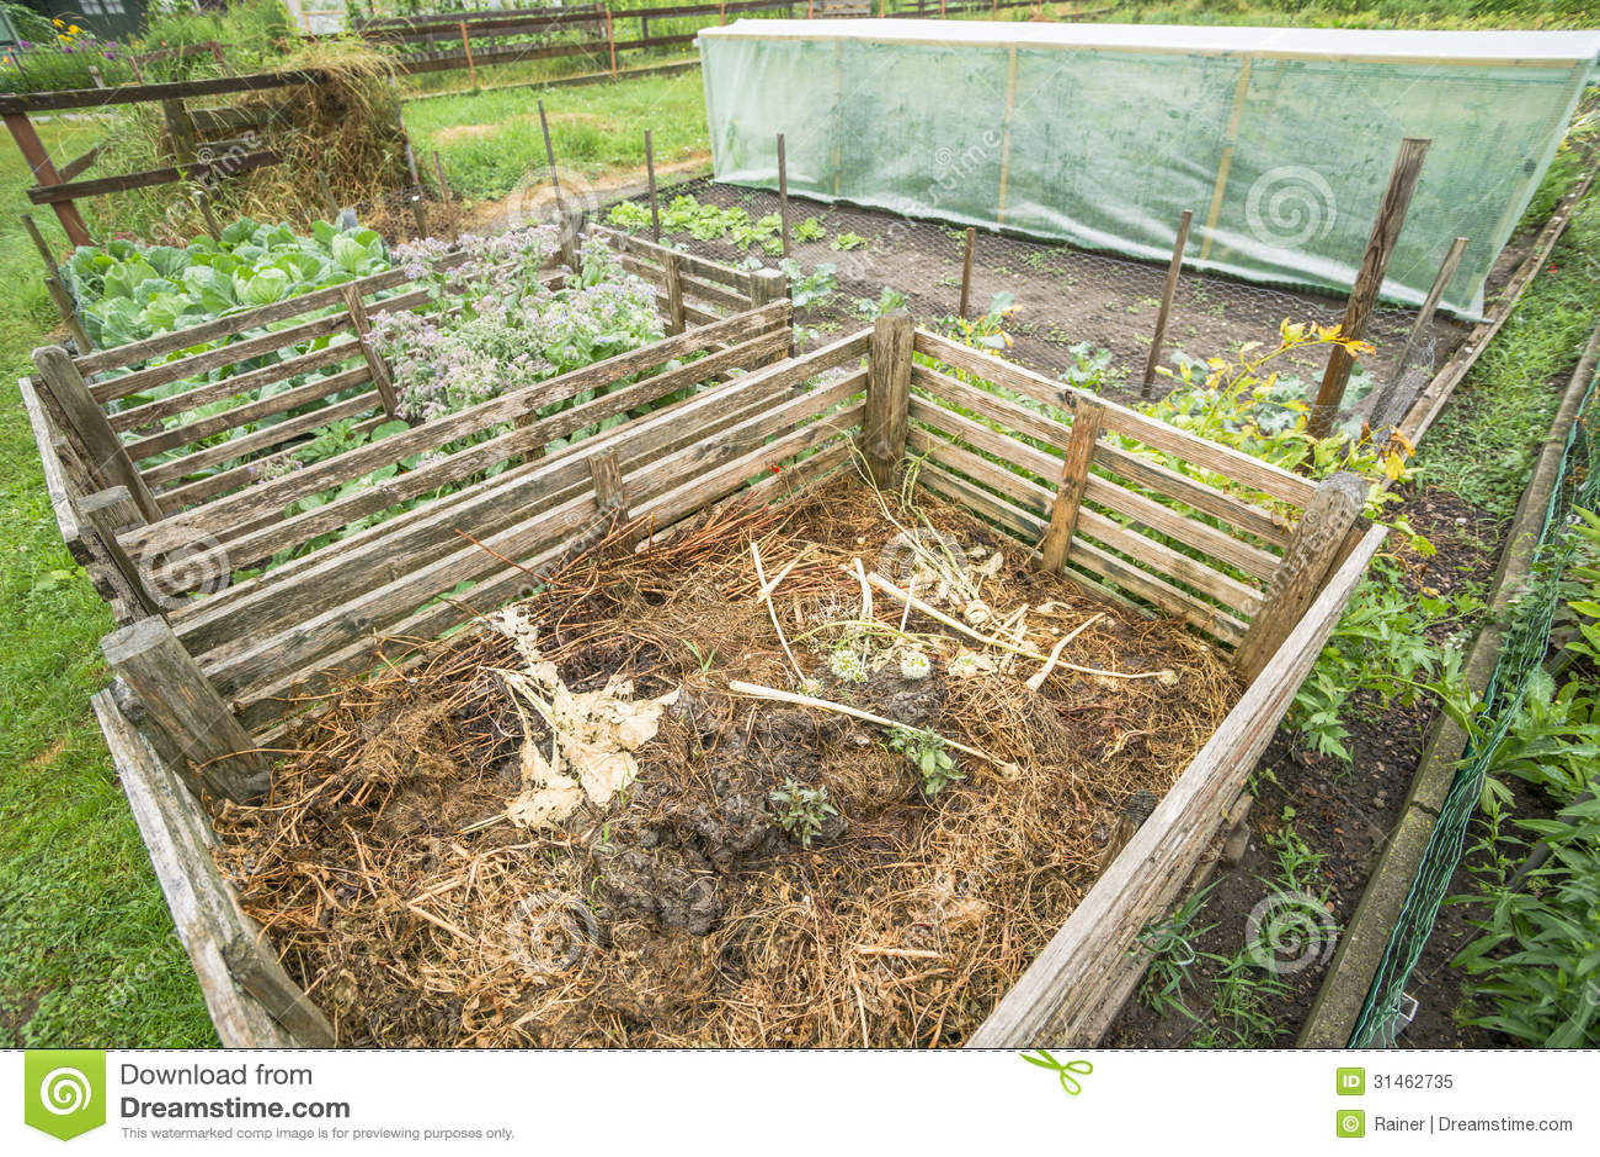 Garden Compost Bin Royalty Free Stock Photo Image 31462735